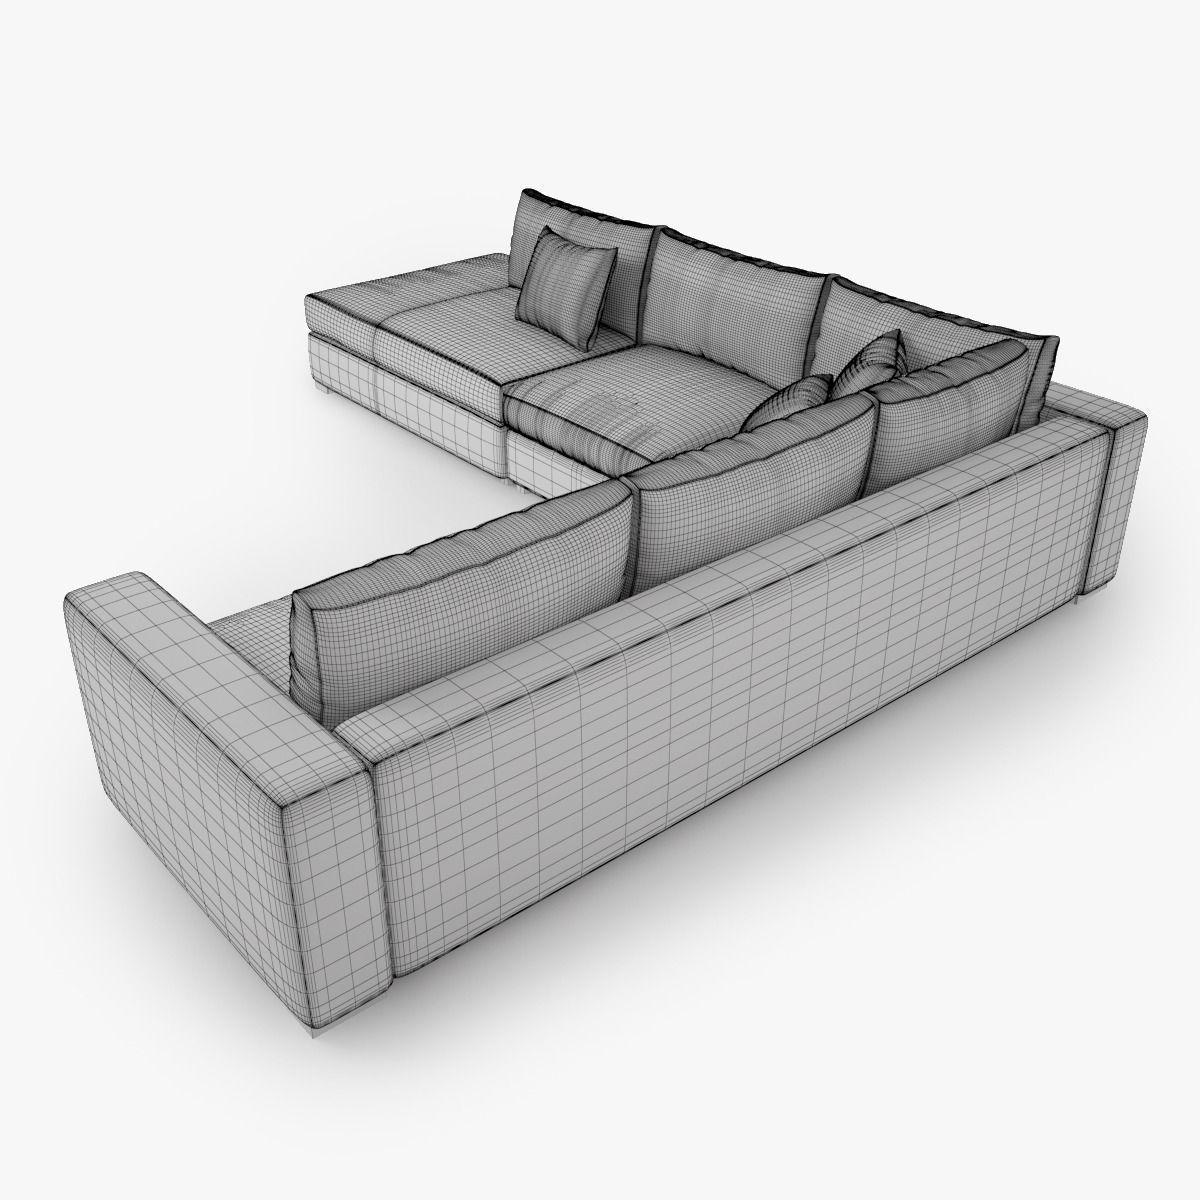 boconcept cenova bg52 3d model max obj fbx. Black Bedroom Furniture Sets. Home Design Ideas